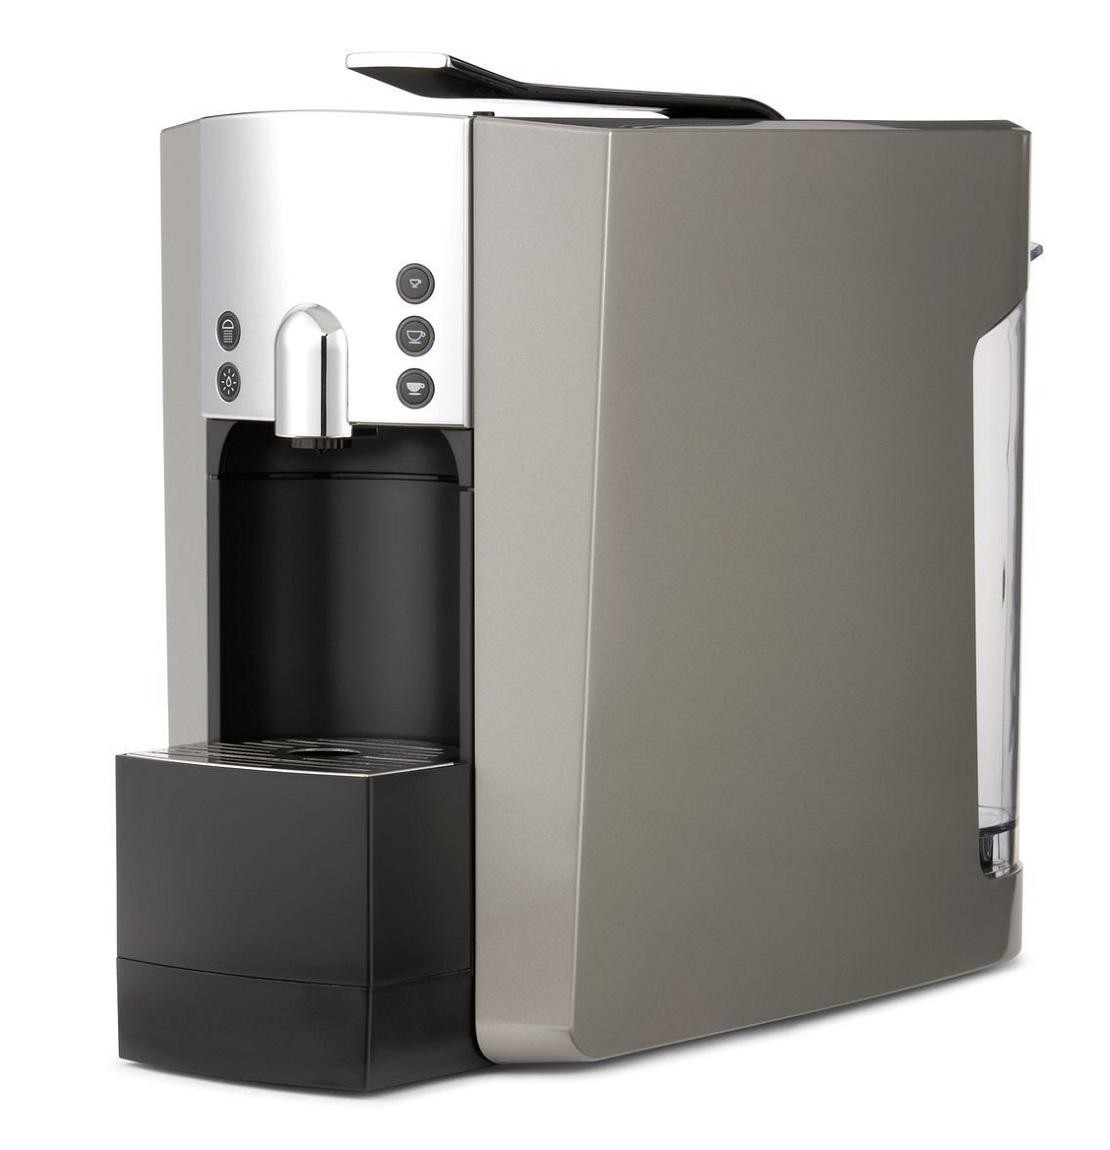 verismo-600-silver.jpg